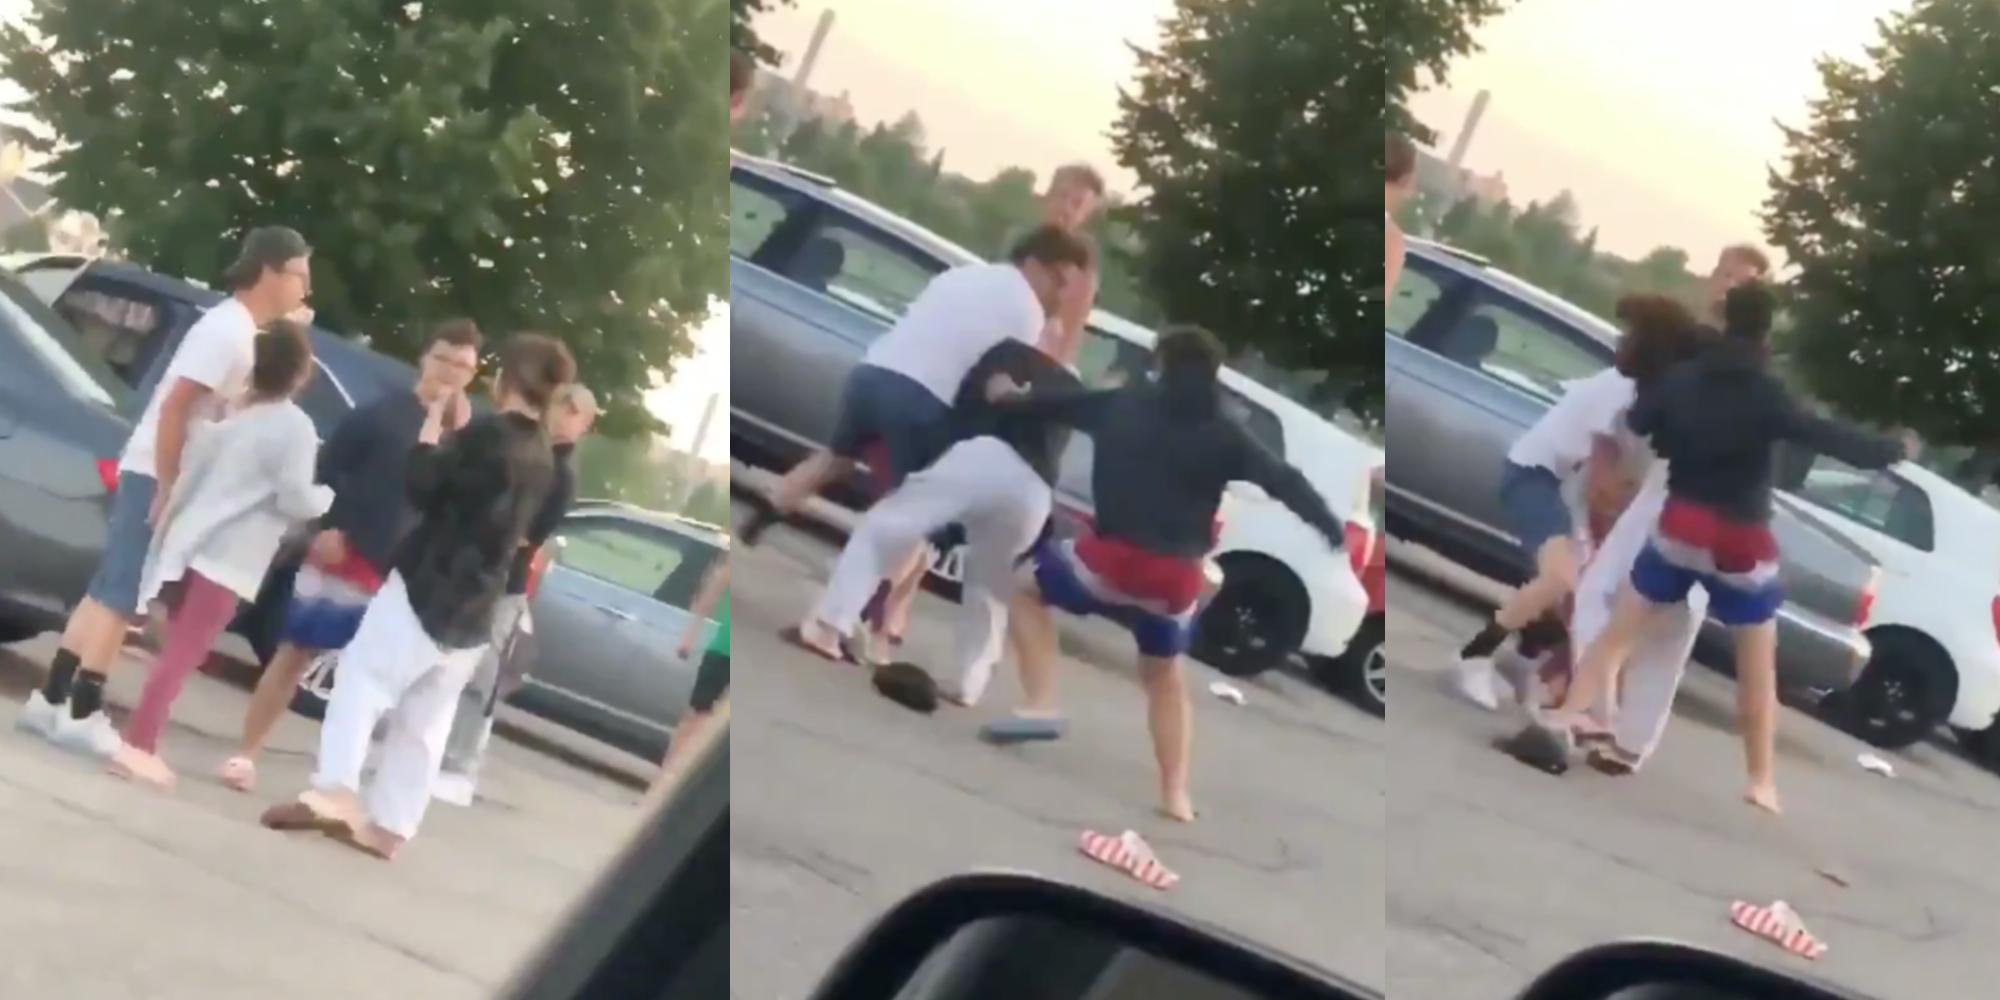 Kyle Rittenhouse punching girl